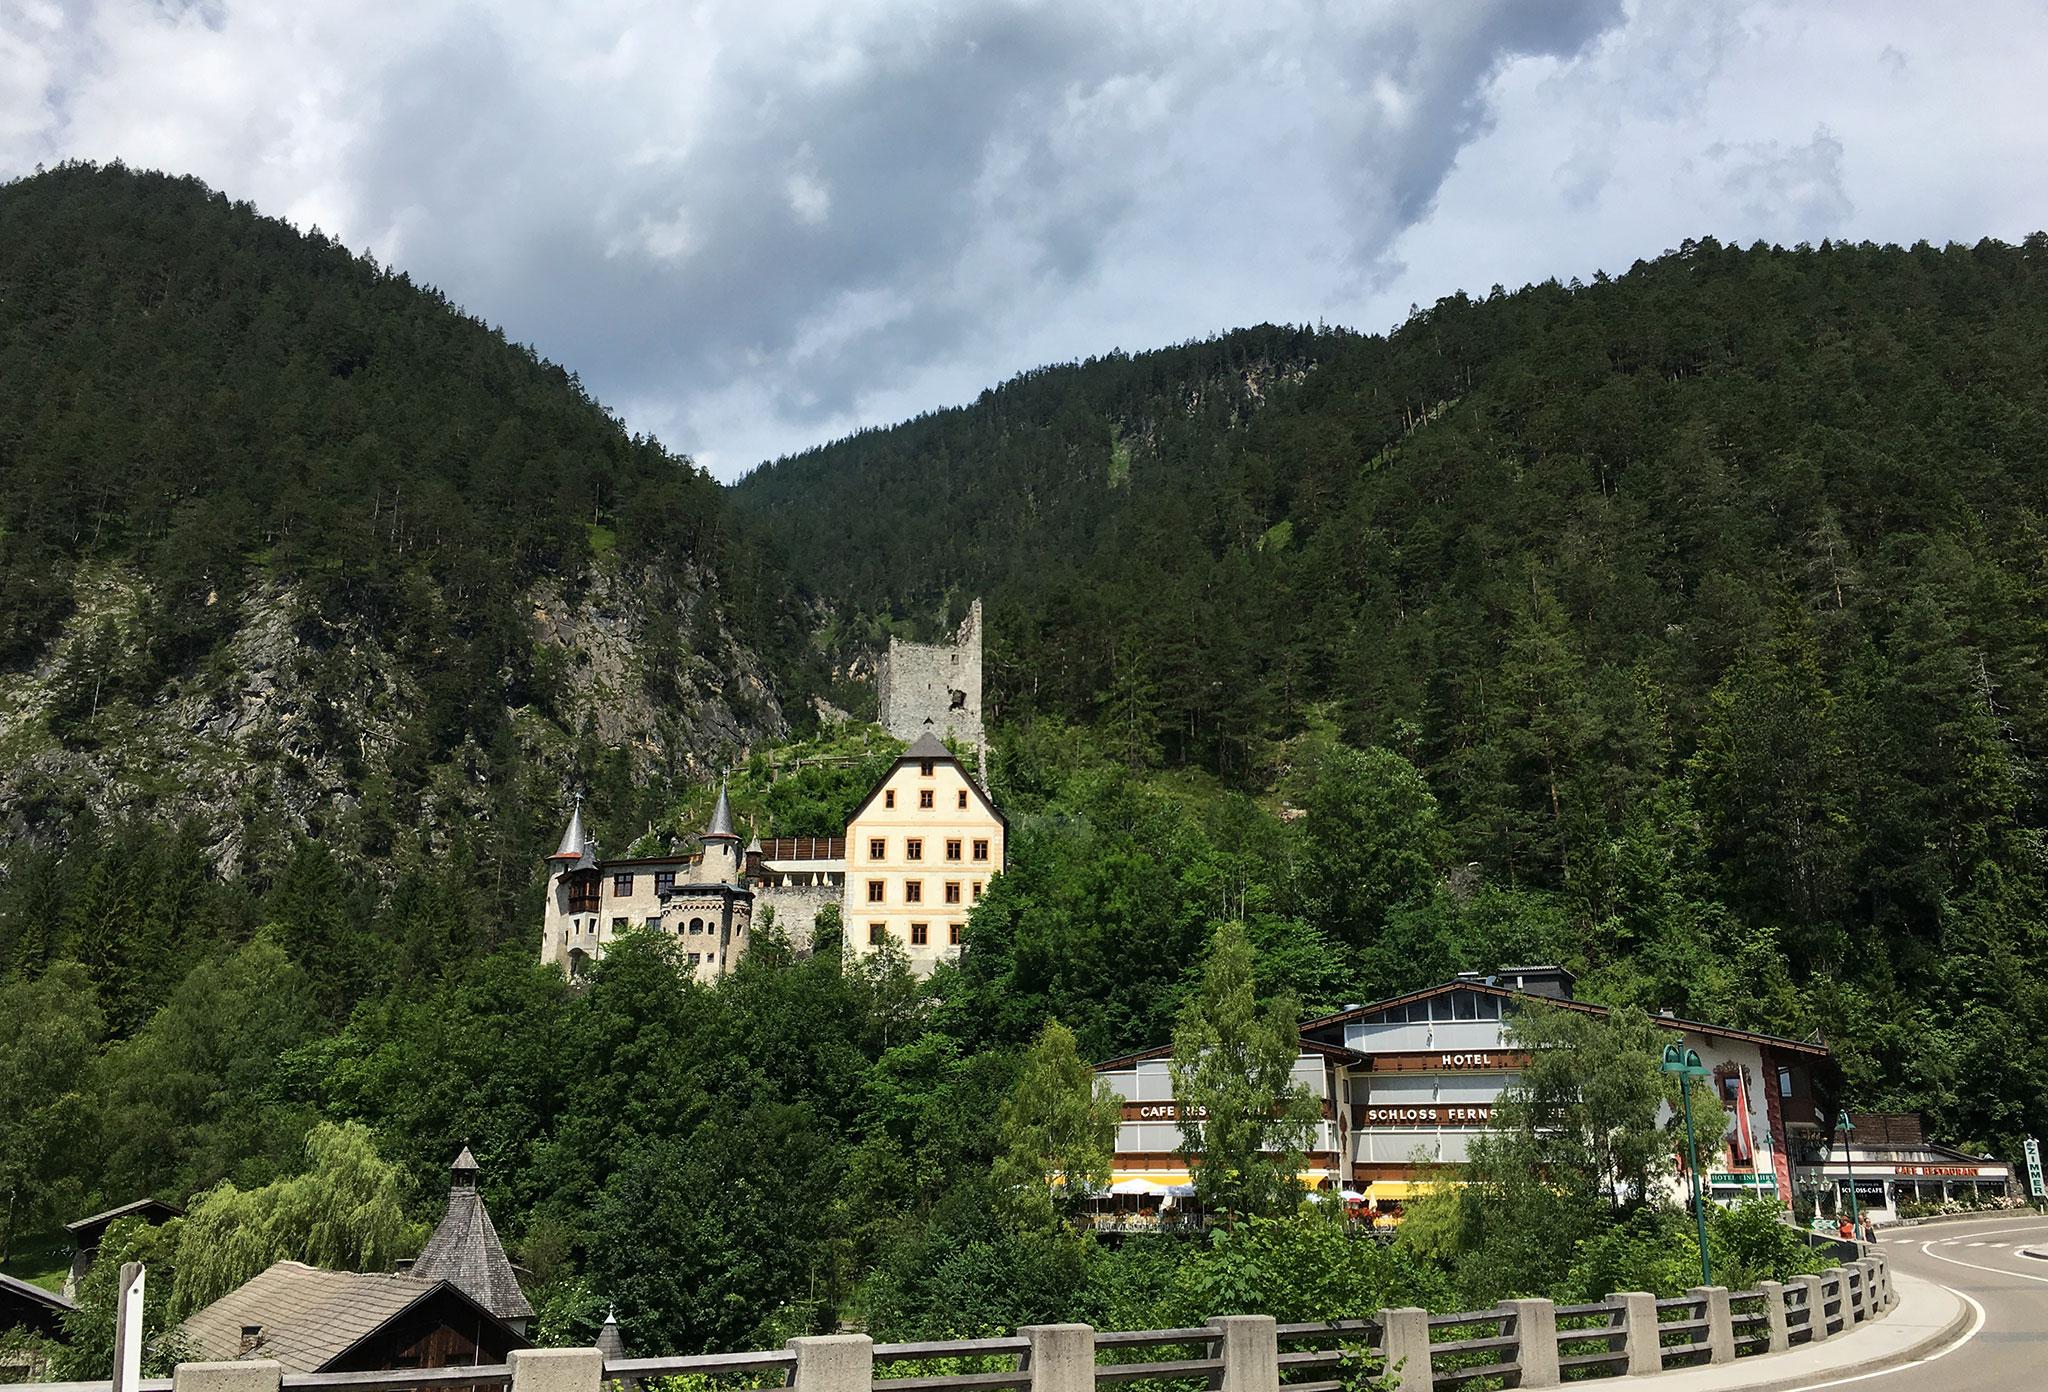 Along the road passing Schloss Fernsteinsee.